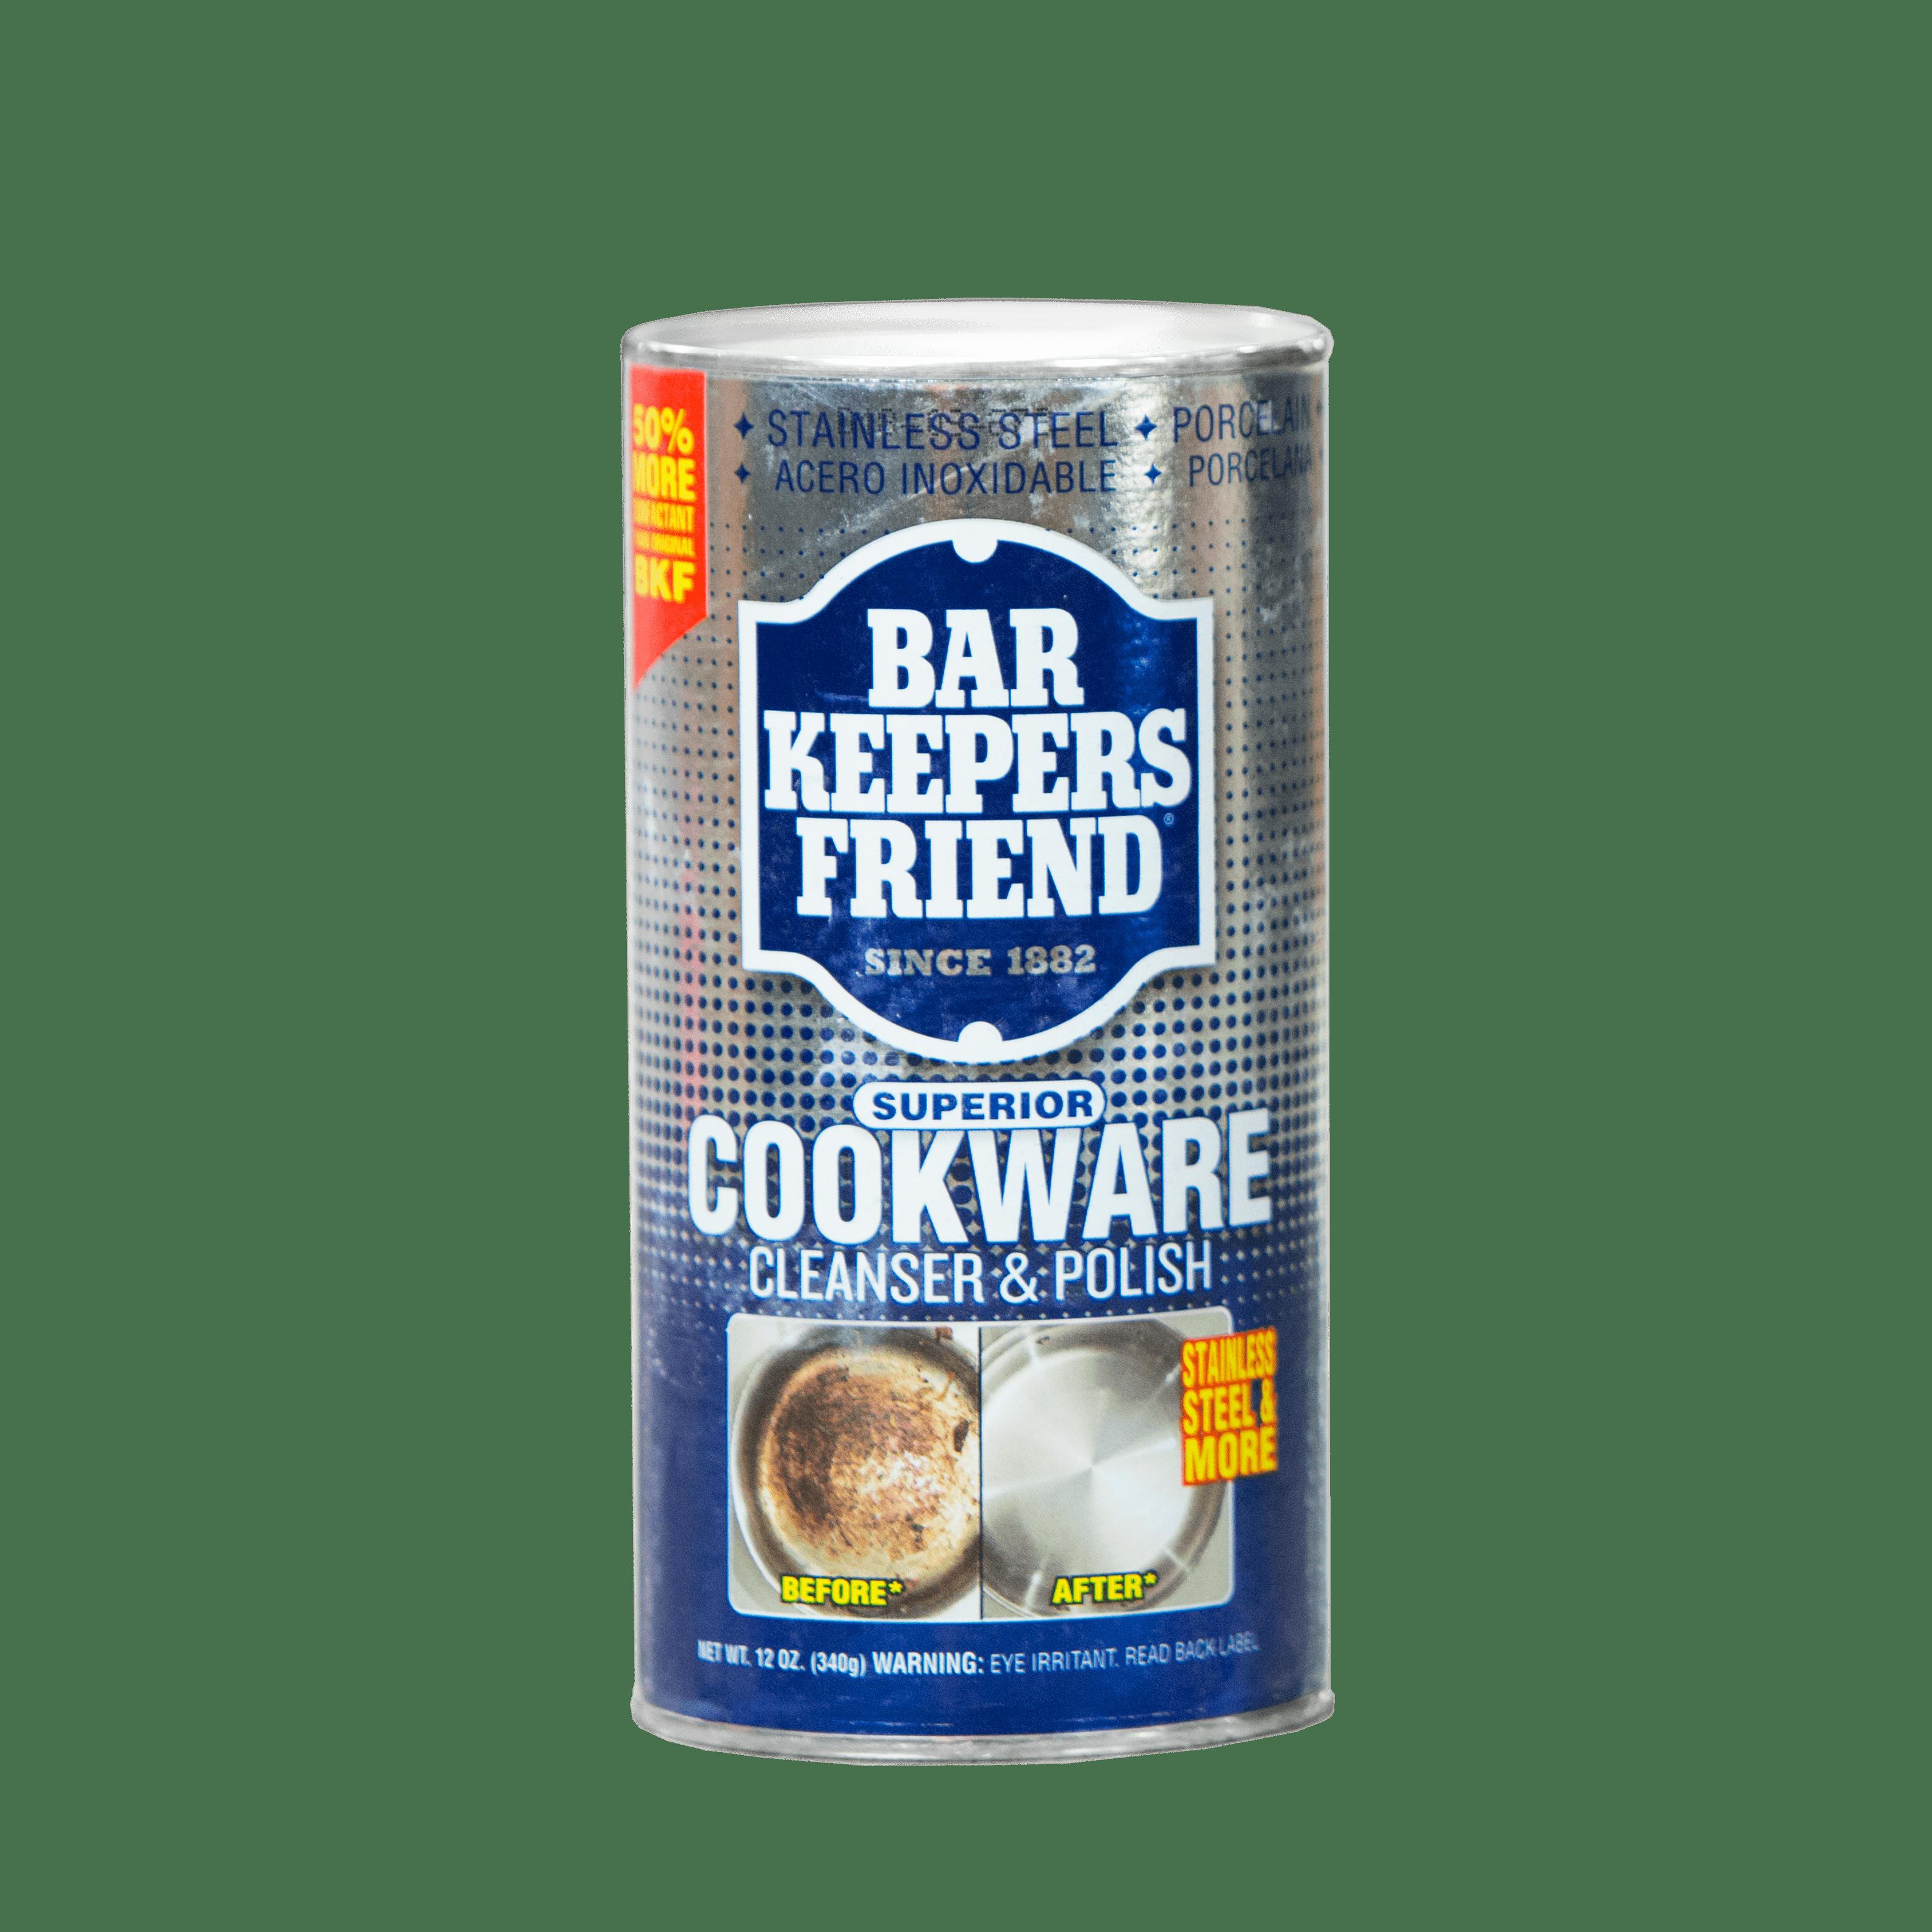 Bar Keepers Friend Cookware Cleanser